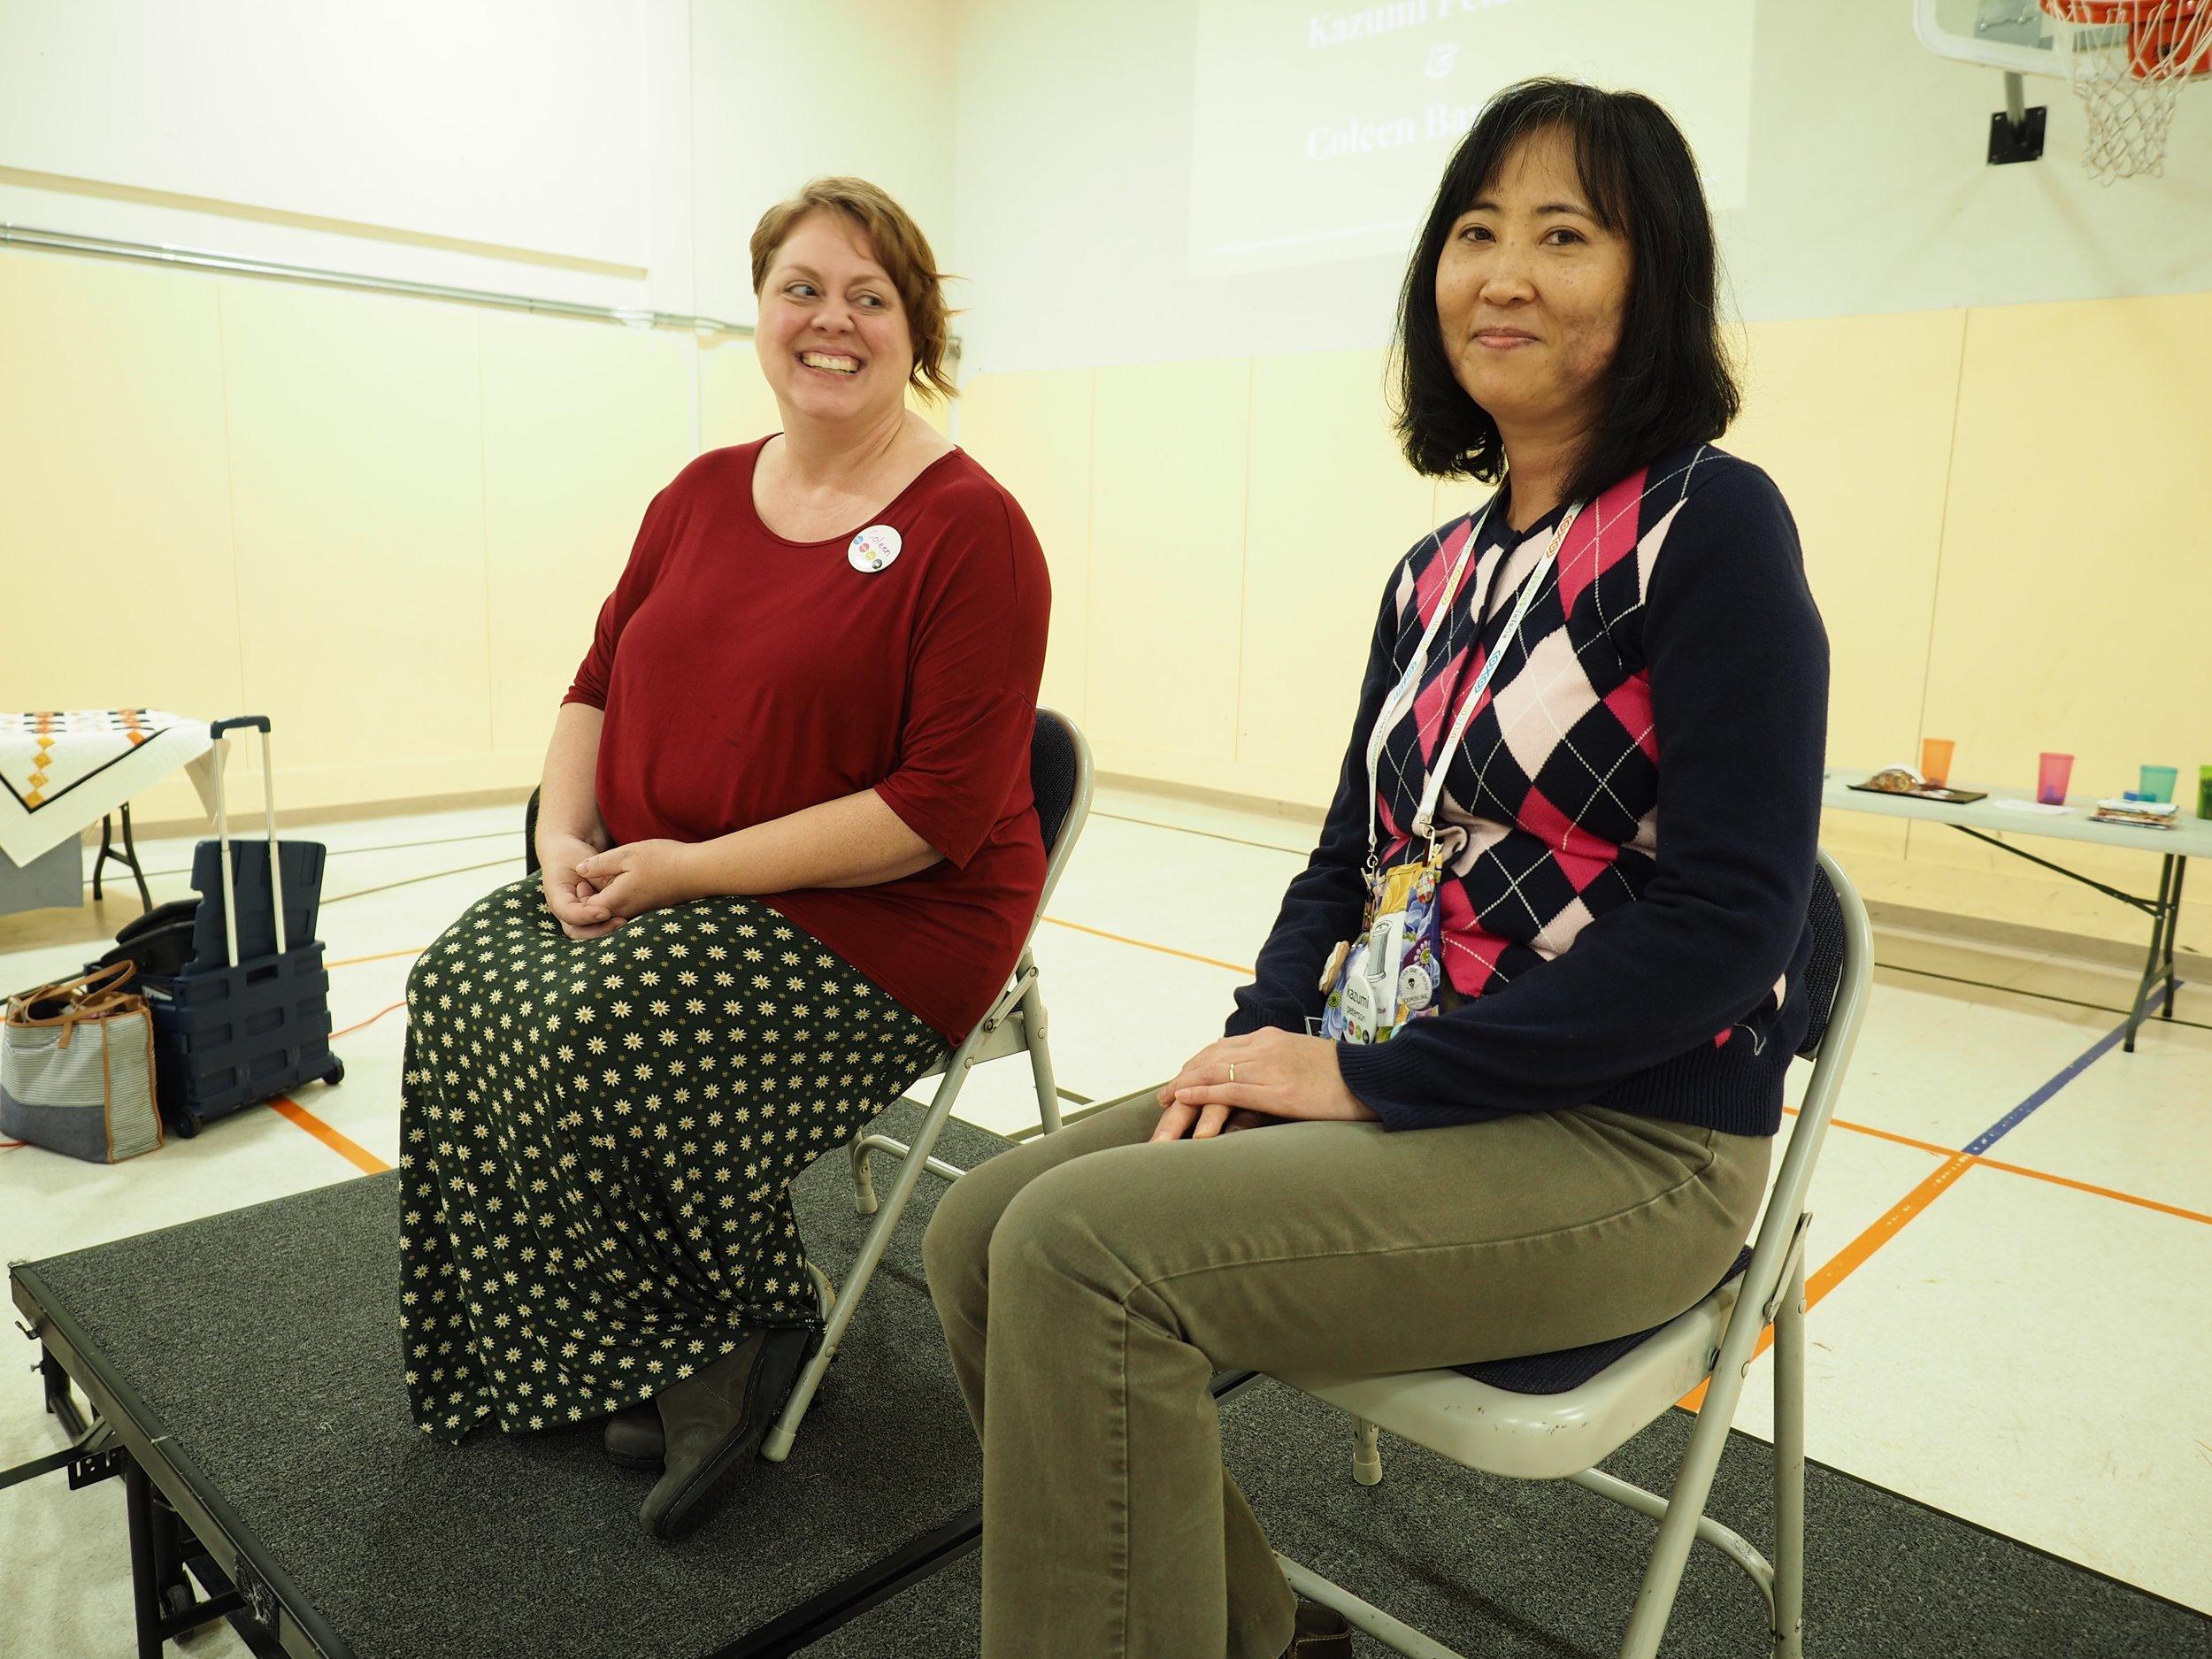 Coleen Barnhardt and Kazumi Peterson